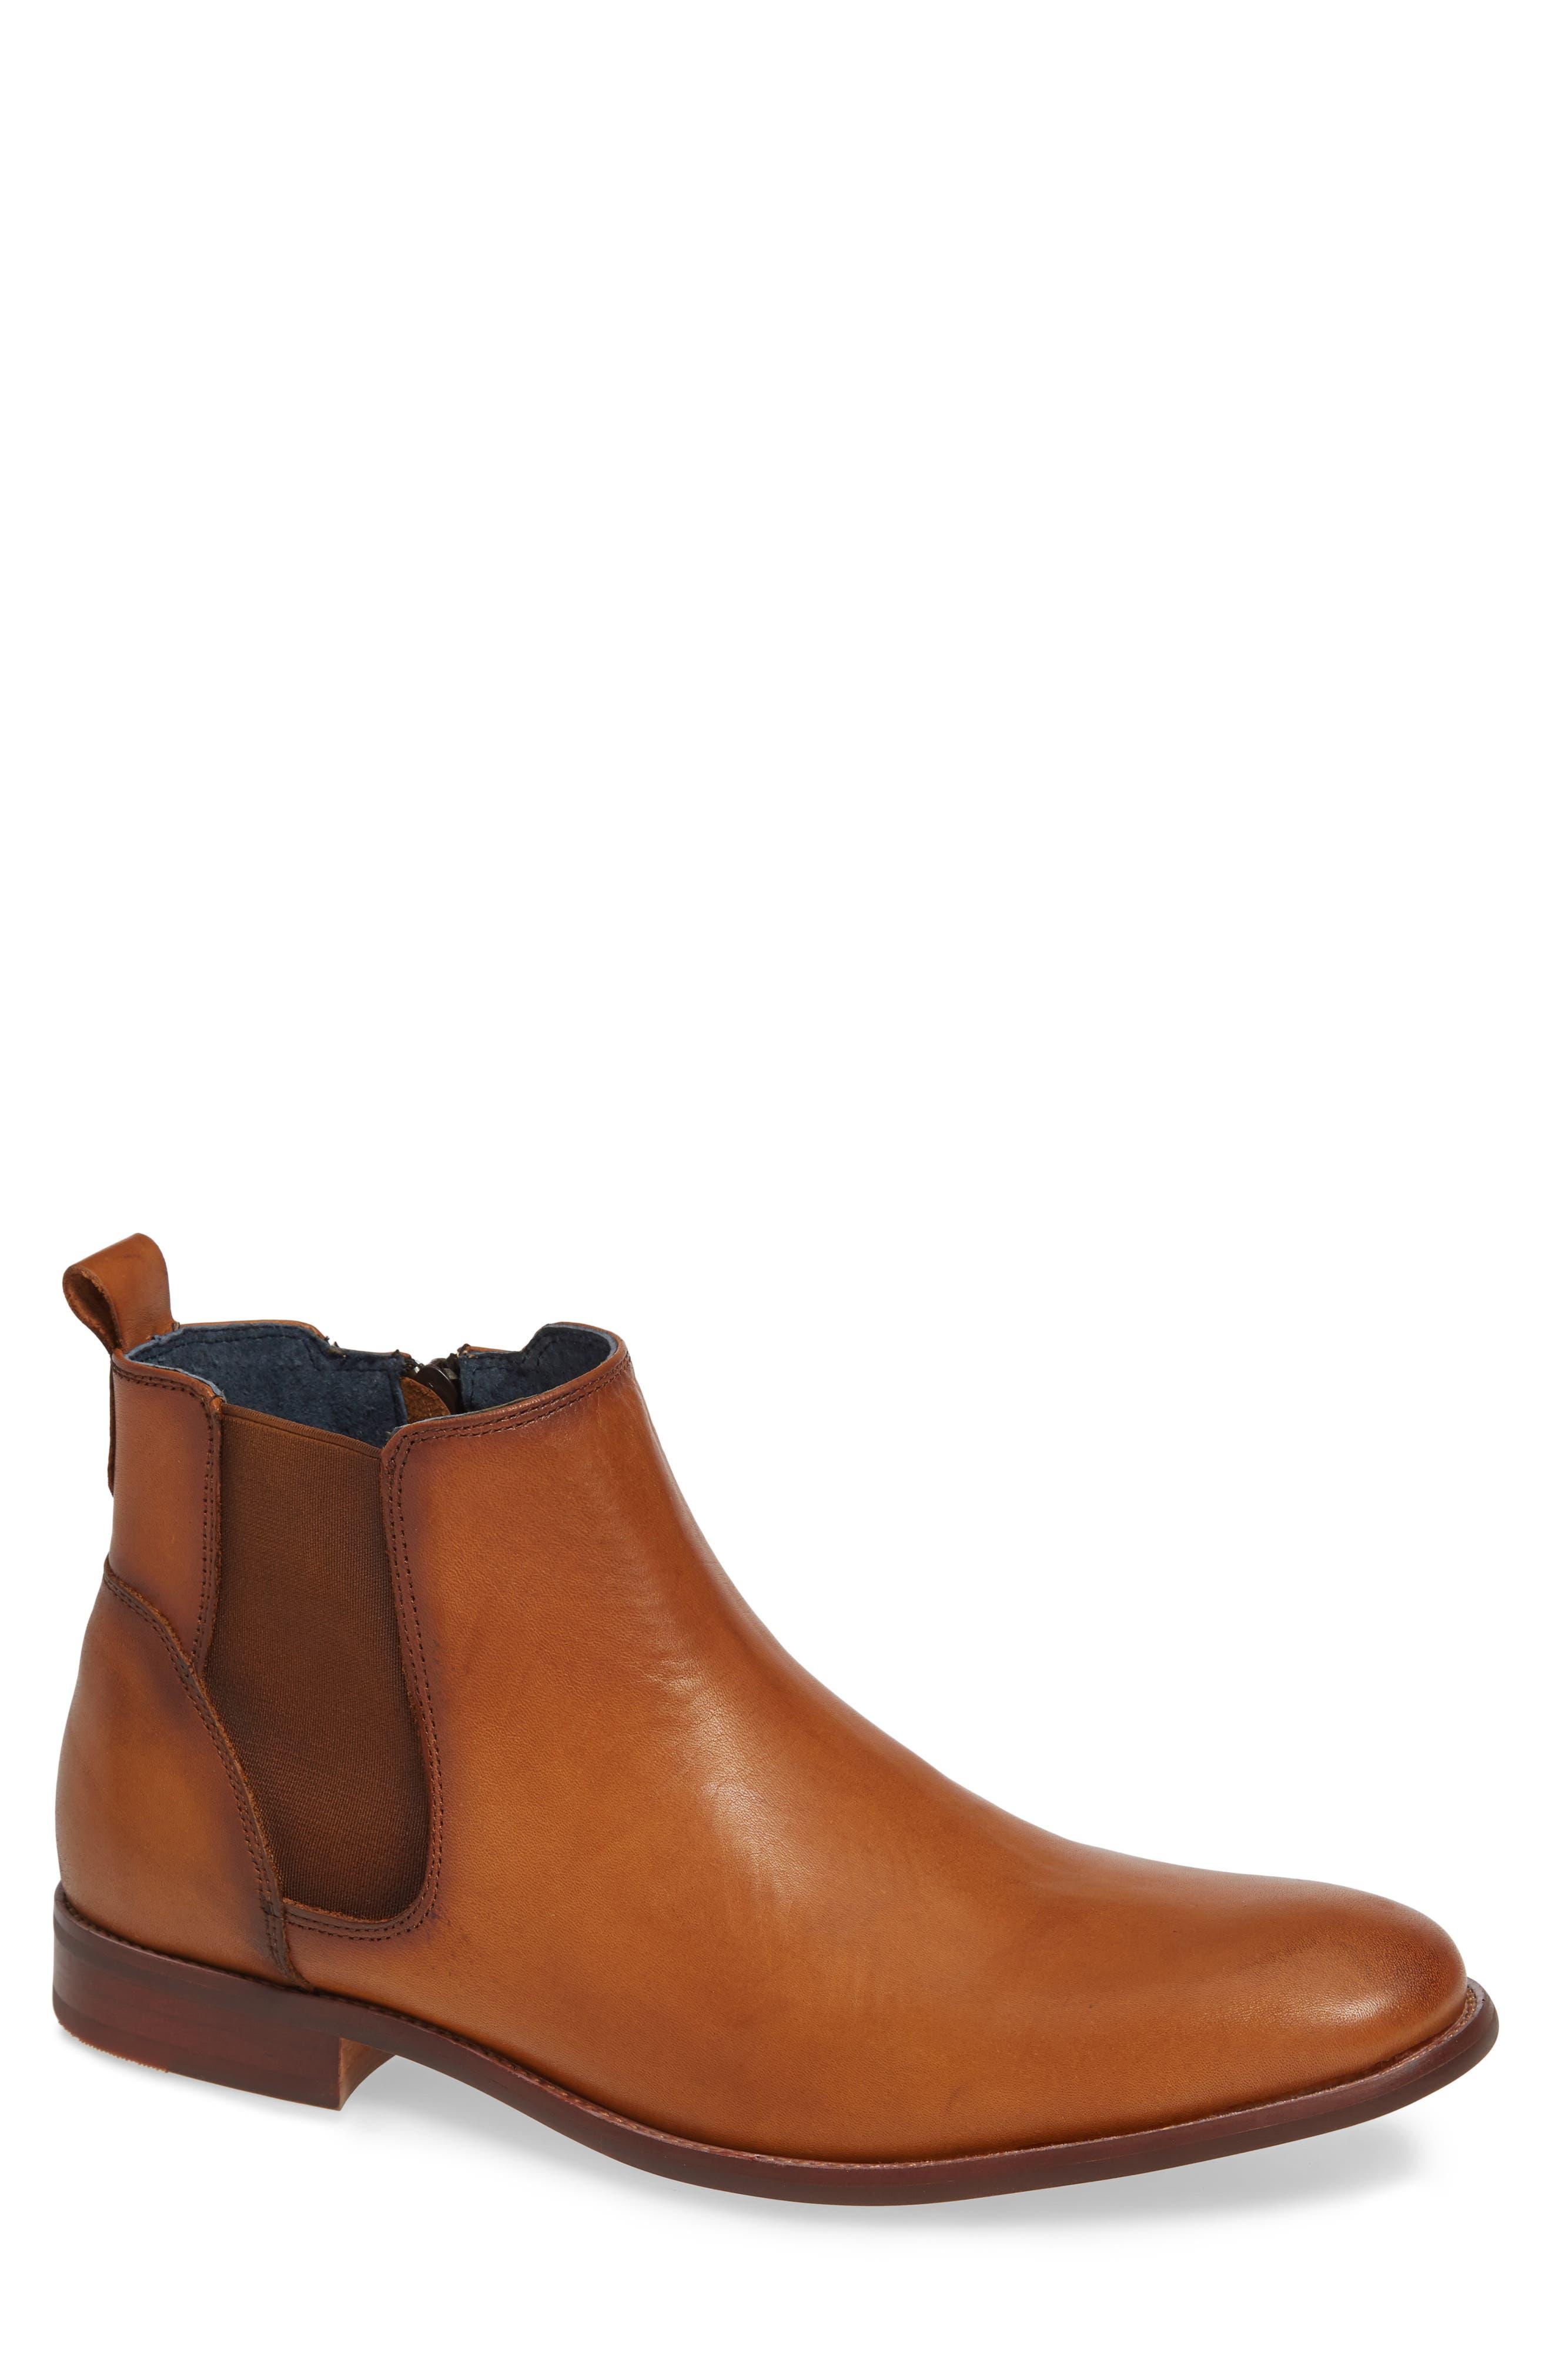 Jump Collin Plain Toe Chelsea Boot, Brown